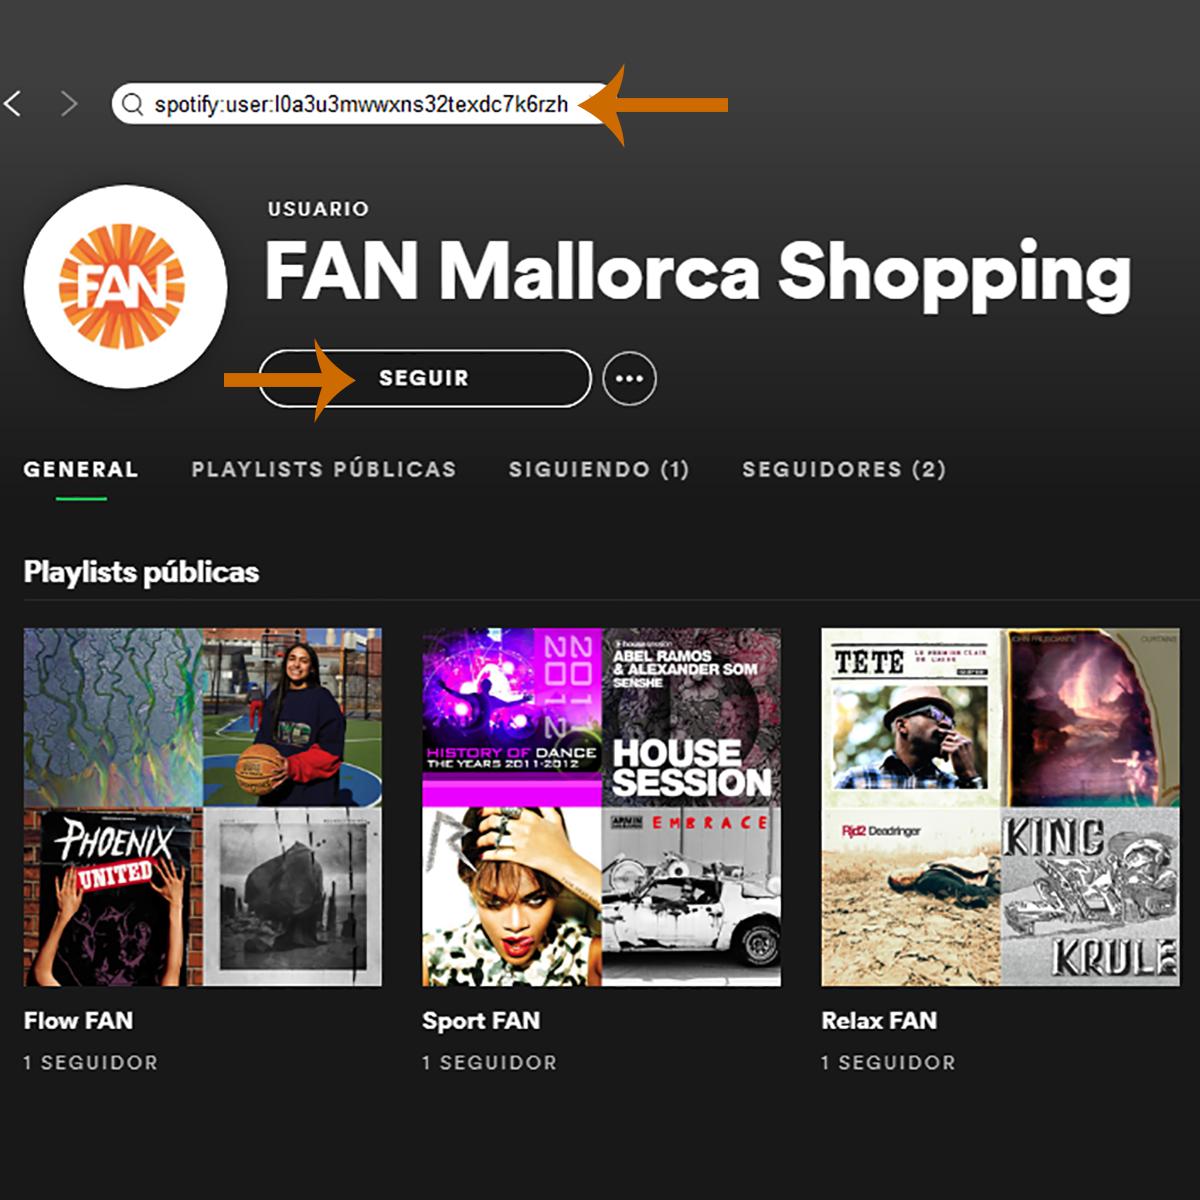 20190708_Spotify FAN Mallorca-IG_FB